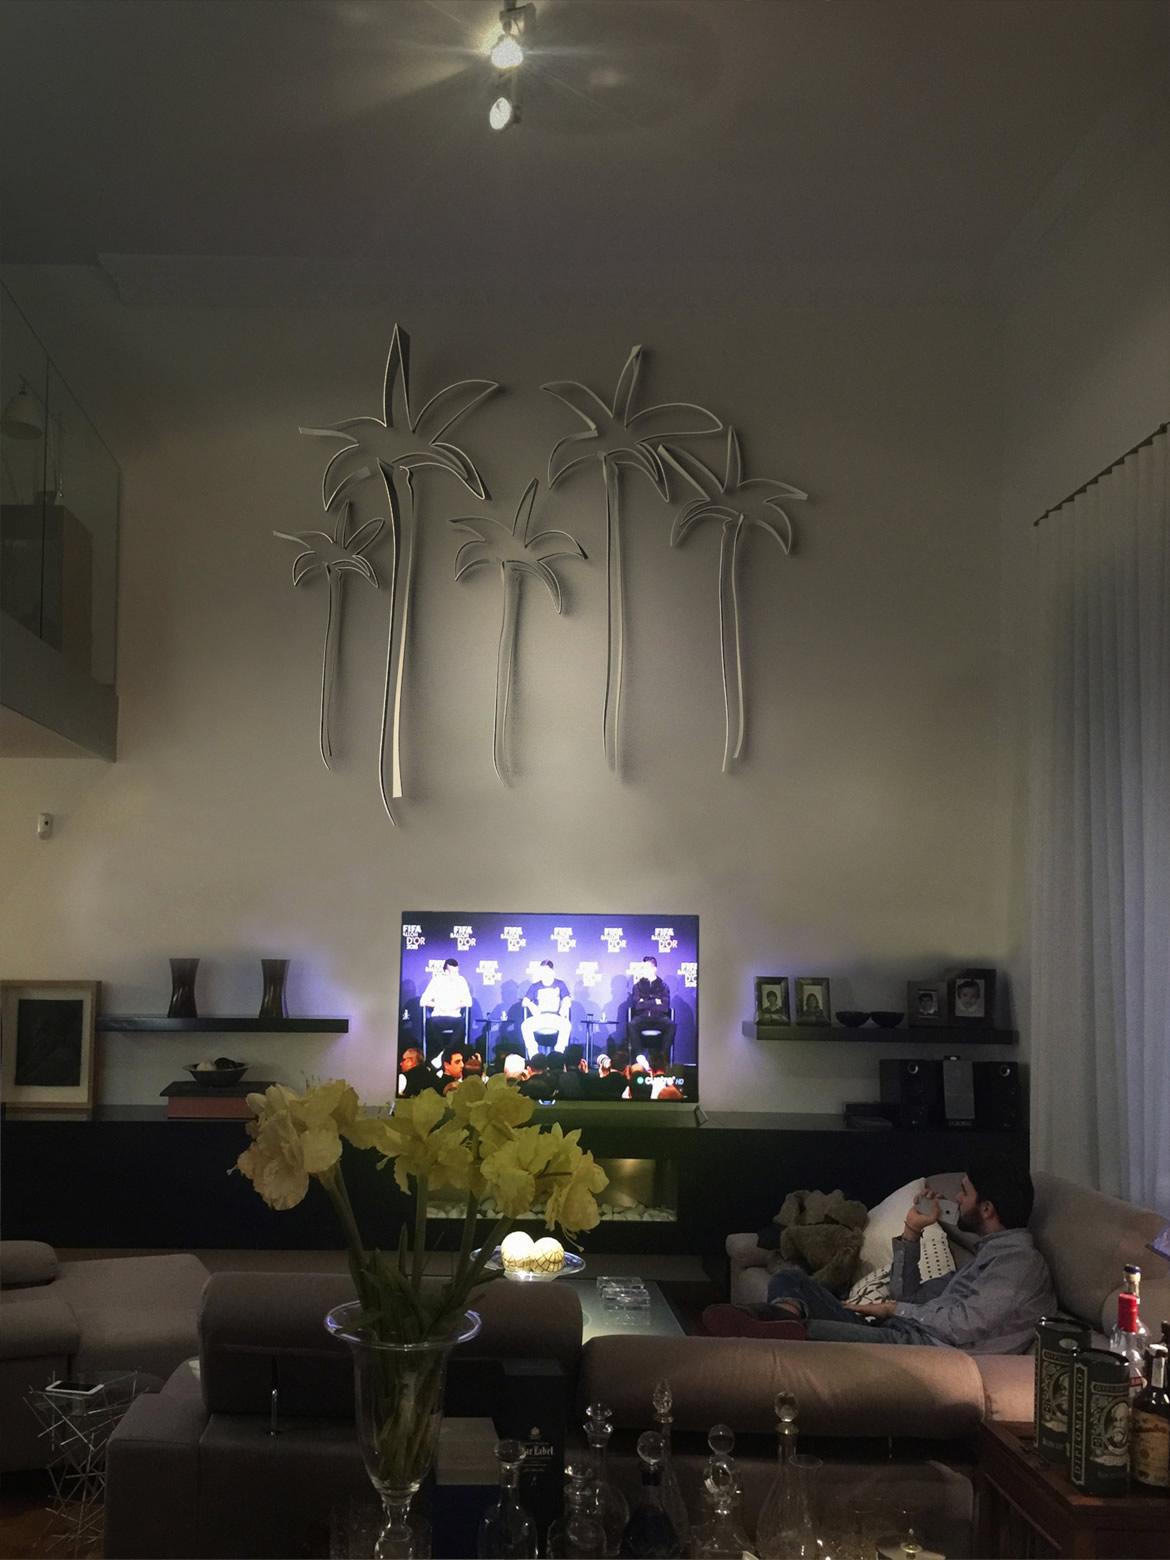 2016 01 13 12.11.43 Escultura de palmera elaborada en Krion